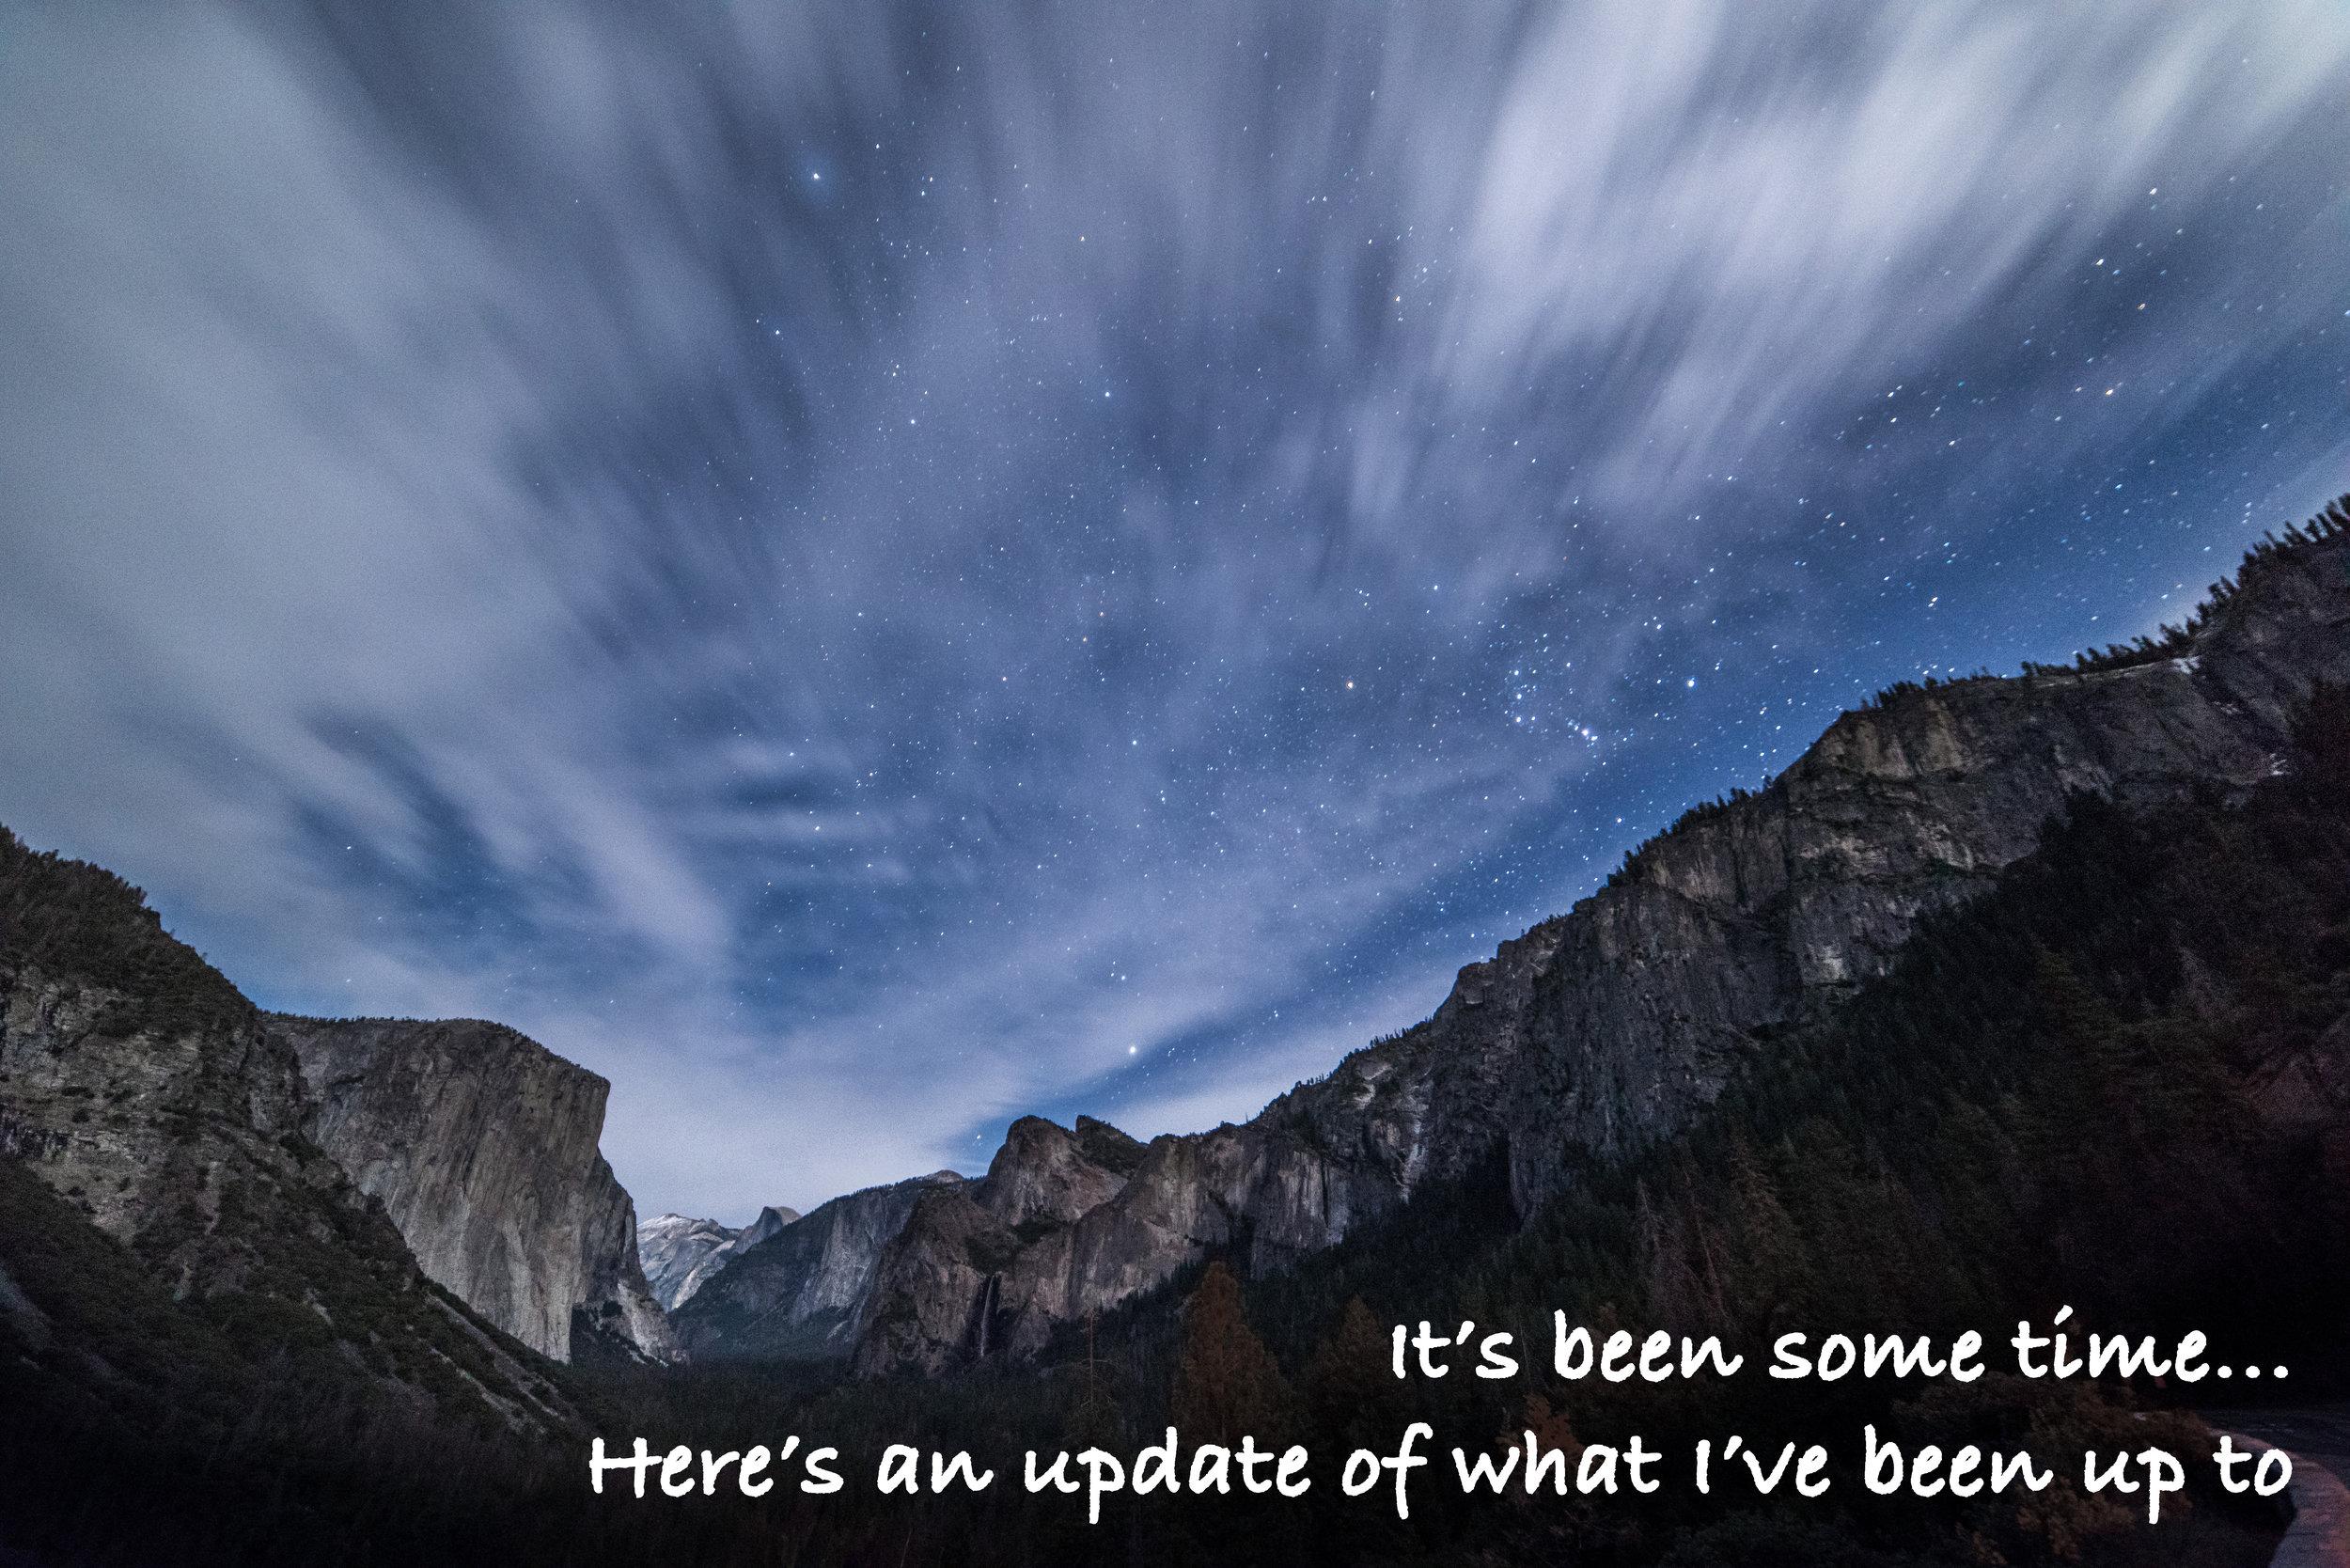 Photograph: Astrophotography shot at Yosemite National Park. (Nikon D810, 14mm, f/2.8, 30sec, ISO2500)